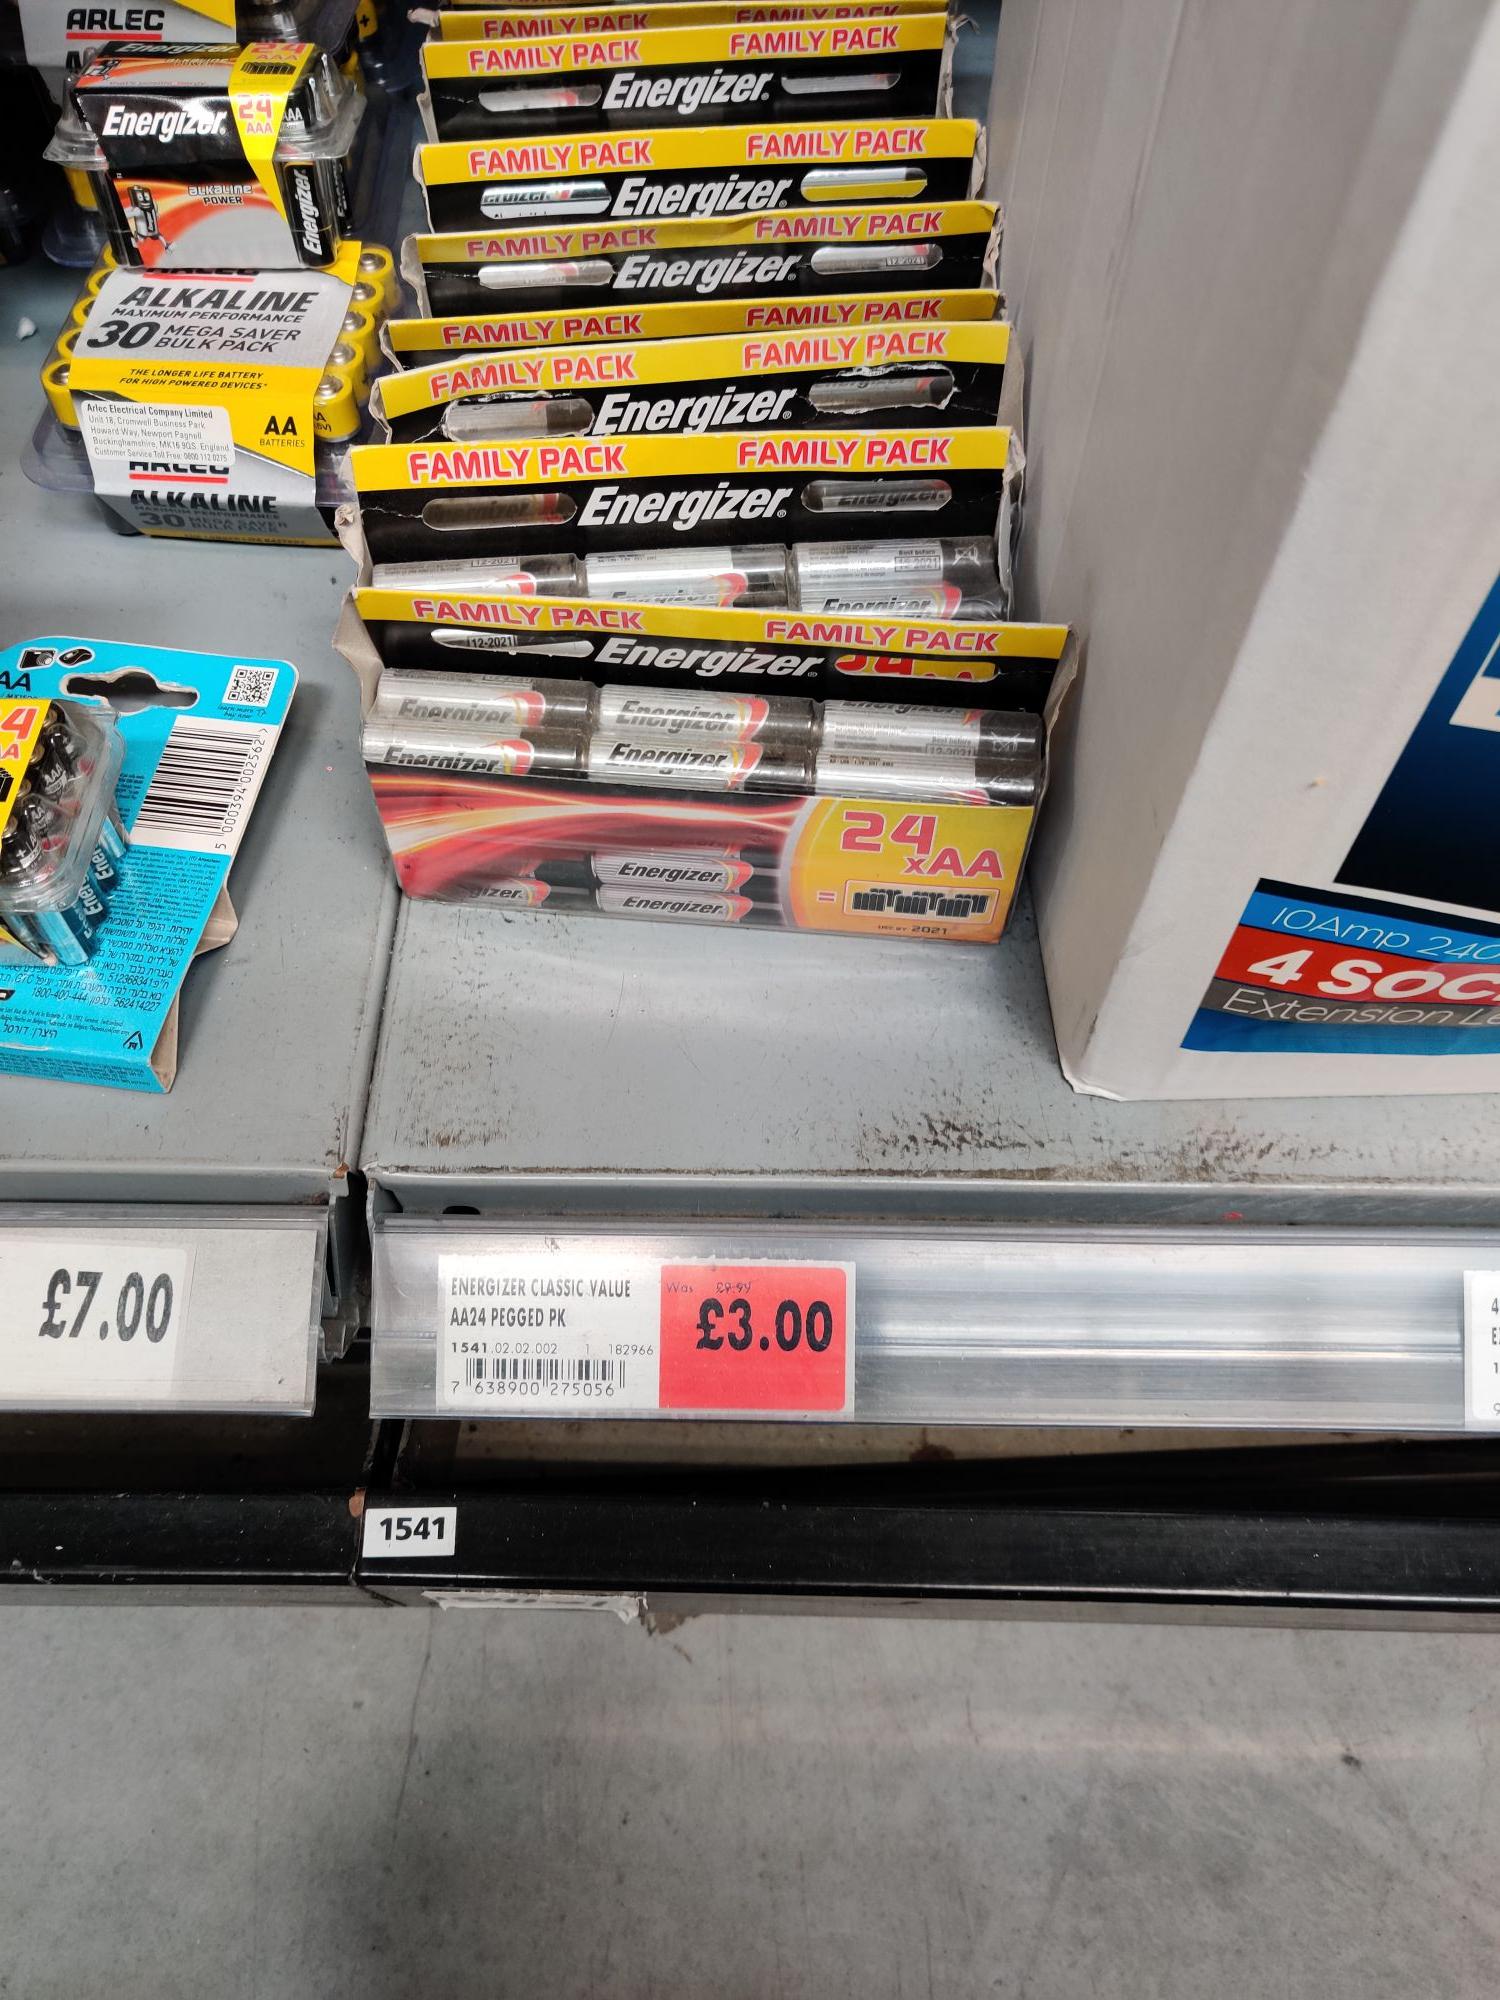 Energizer AA batteries 24 instore Homebase Newtownabbey  maybe nationwide £3